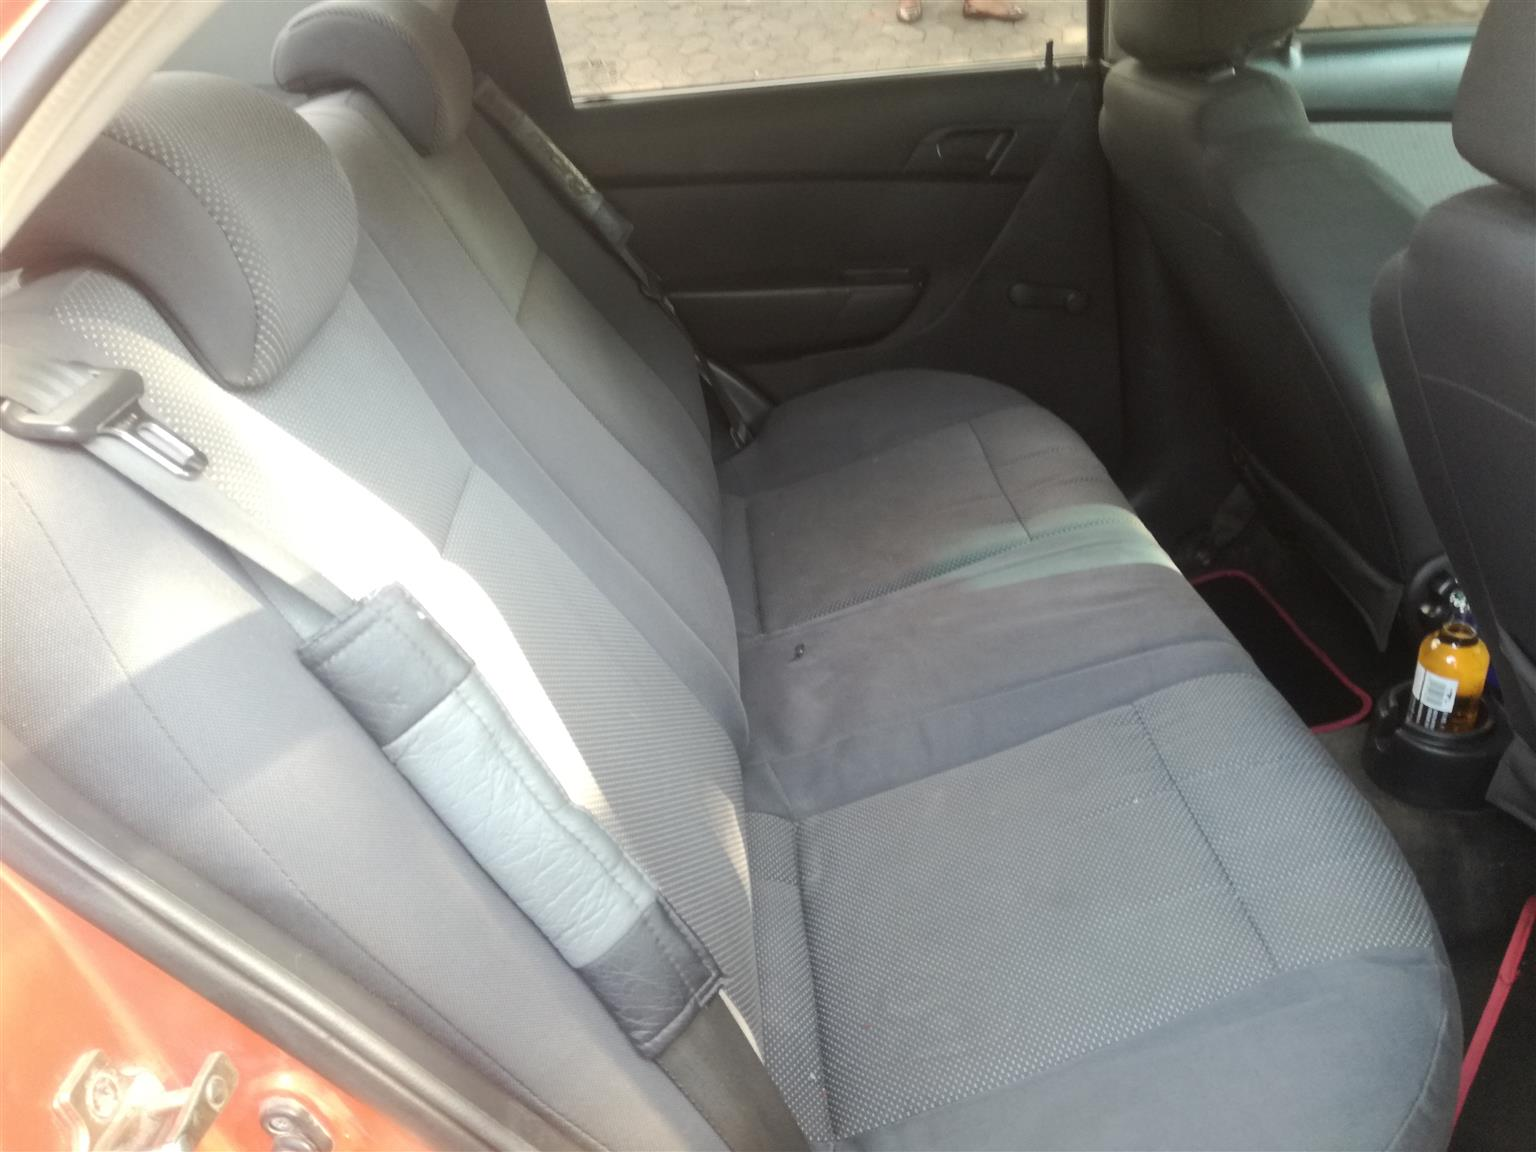 2006 Chevrolet Aveo 1.6 LS hatch